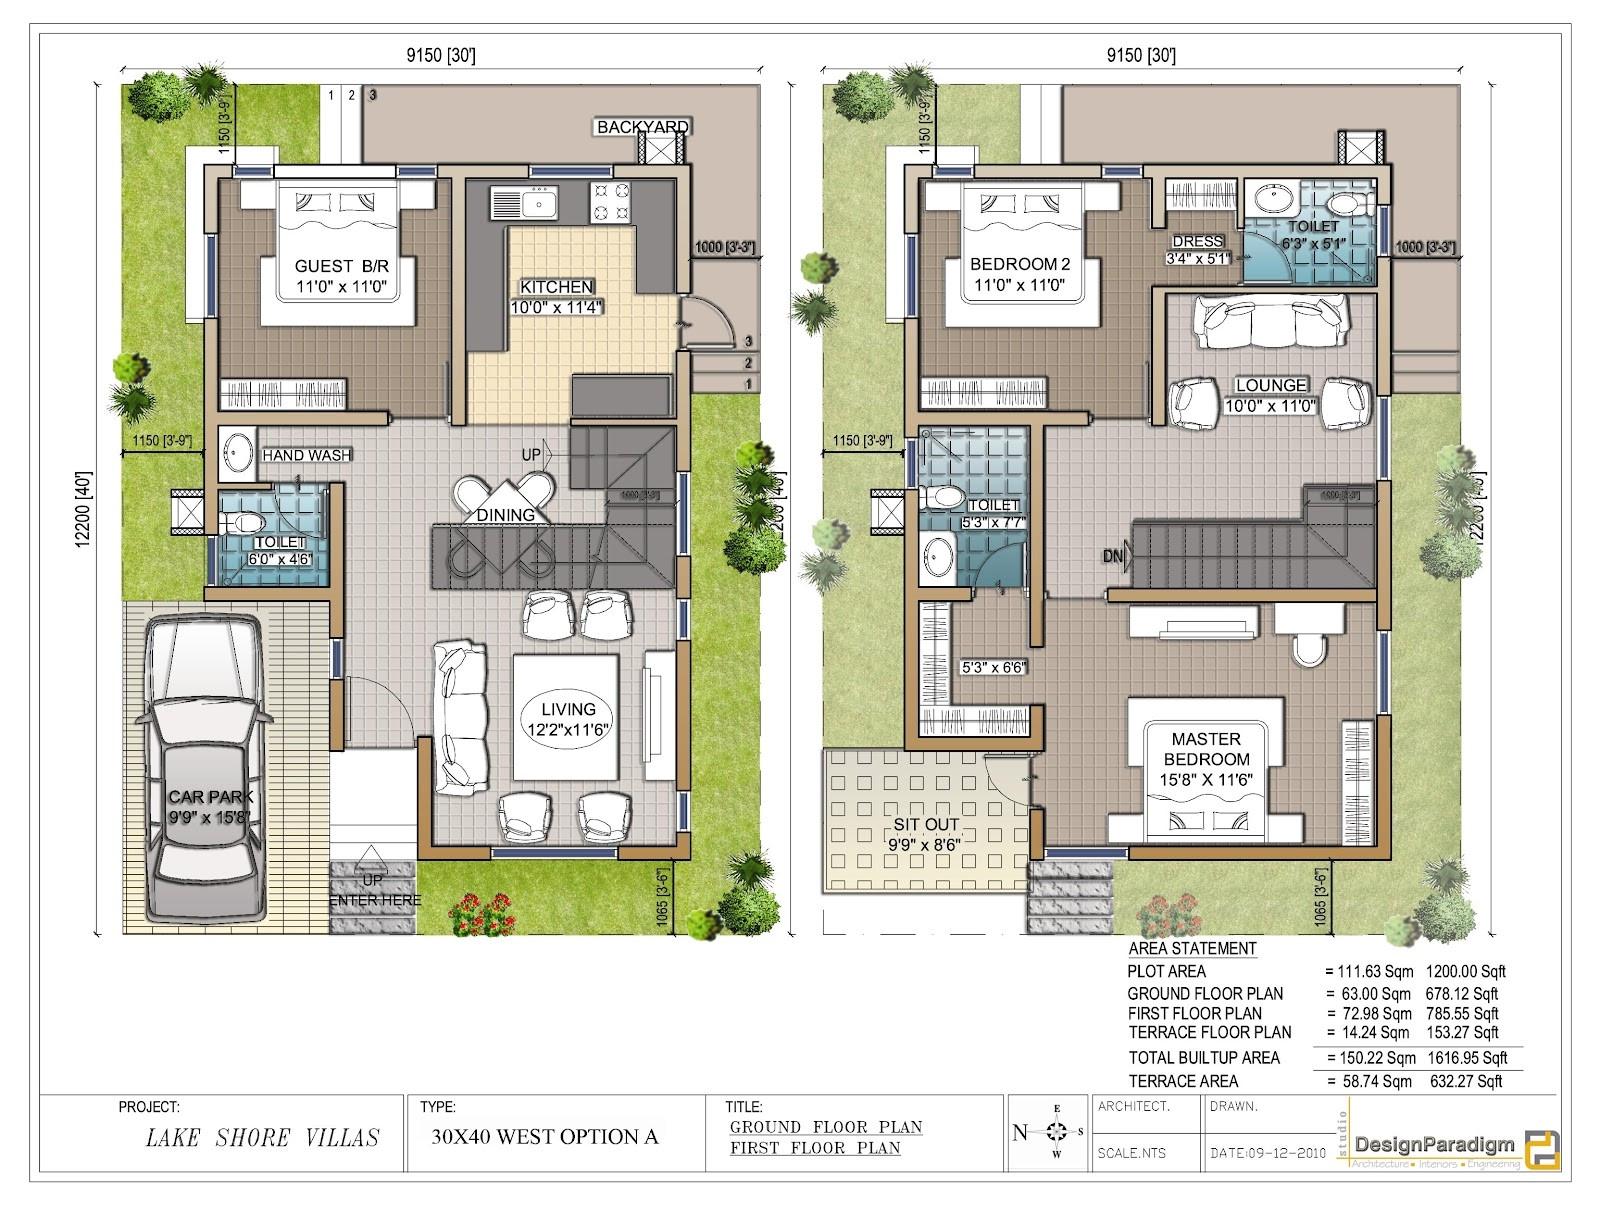 20 x 45 house plans east facing elegant inspiring 30ae 30 house plan 3d exterior